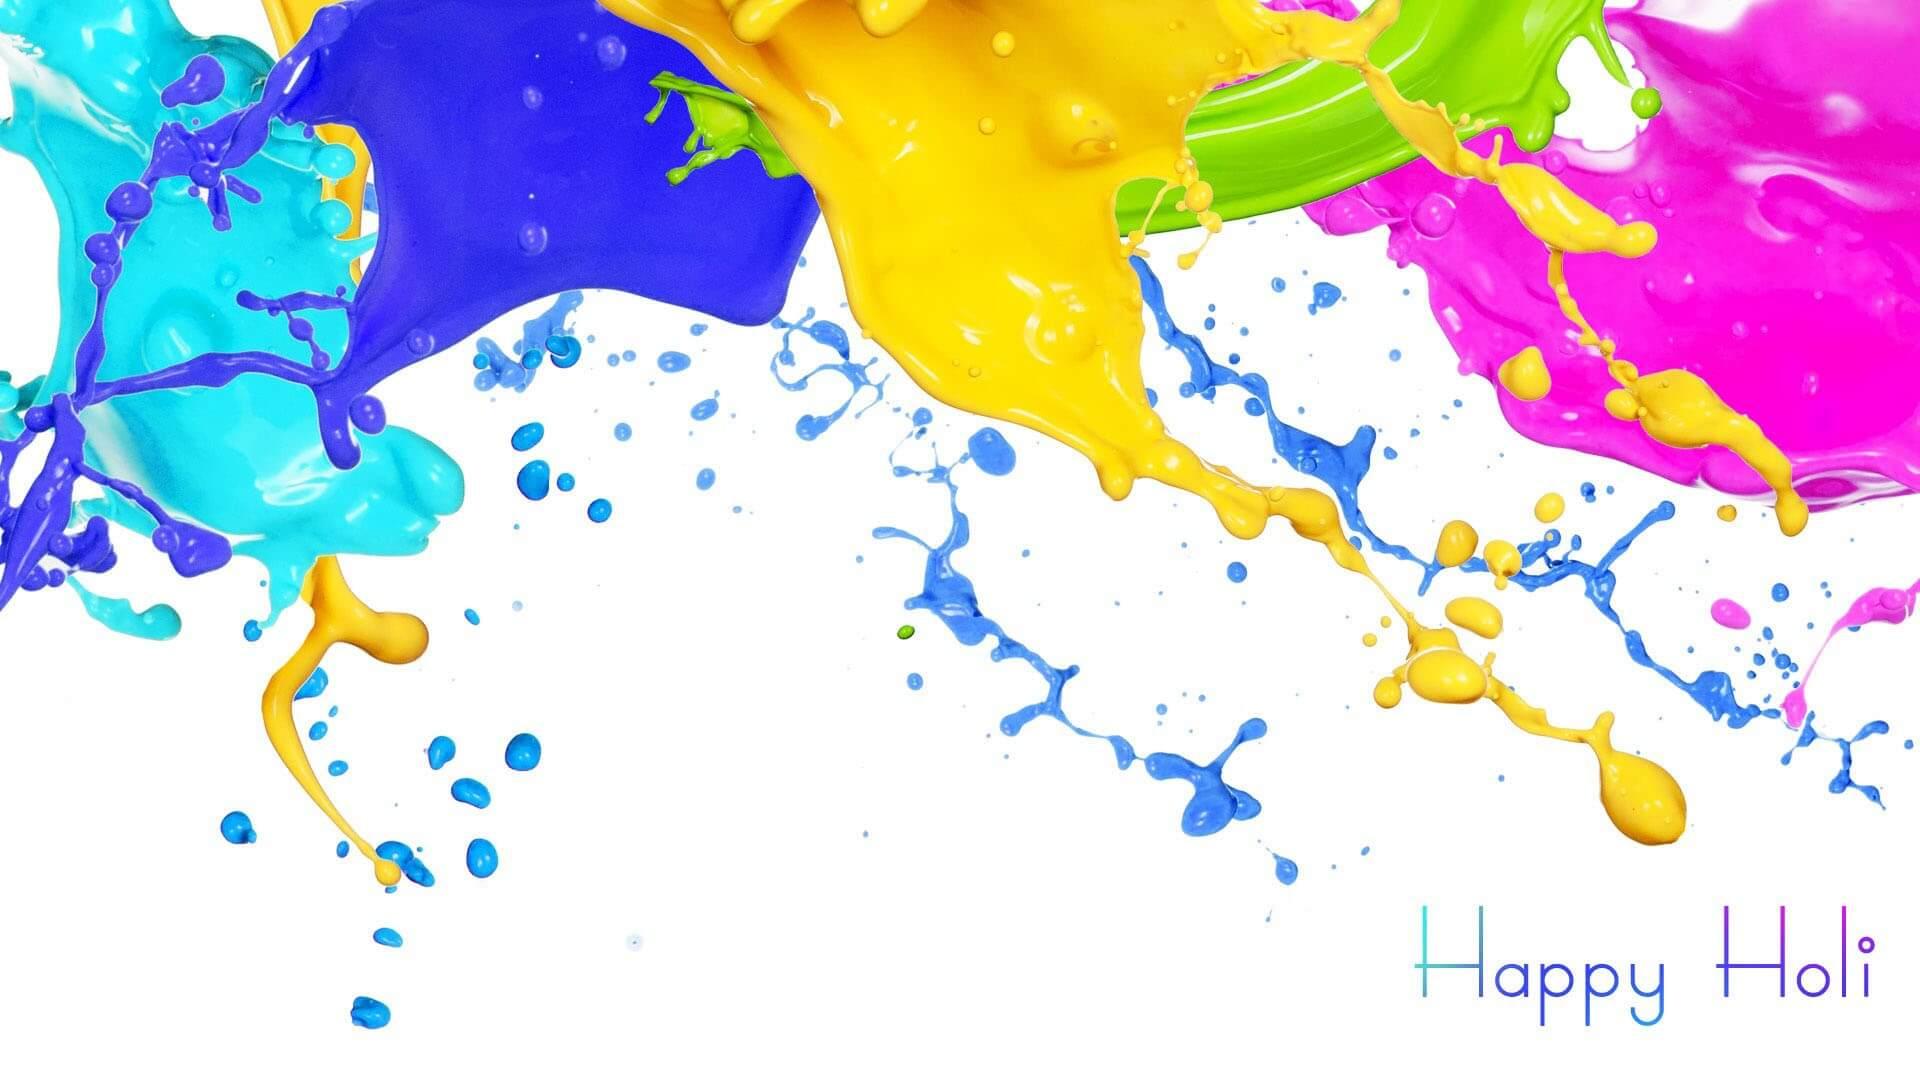 3d Radha Krishna Wallpaper Download Happy Holi 3d Wallpaper Background Hd